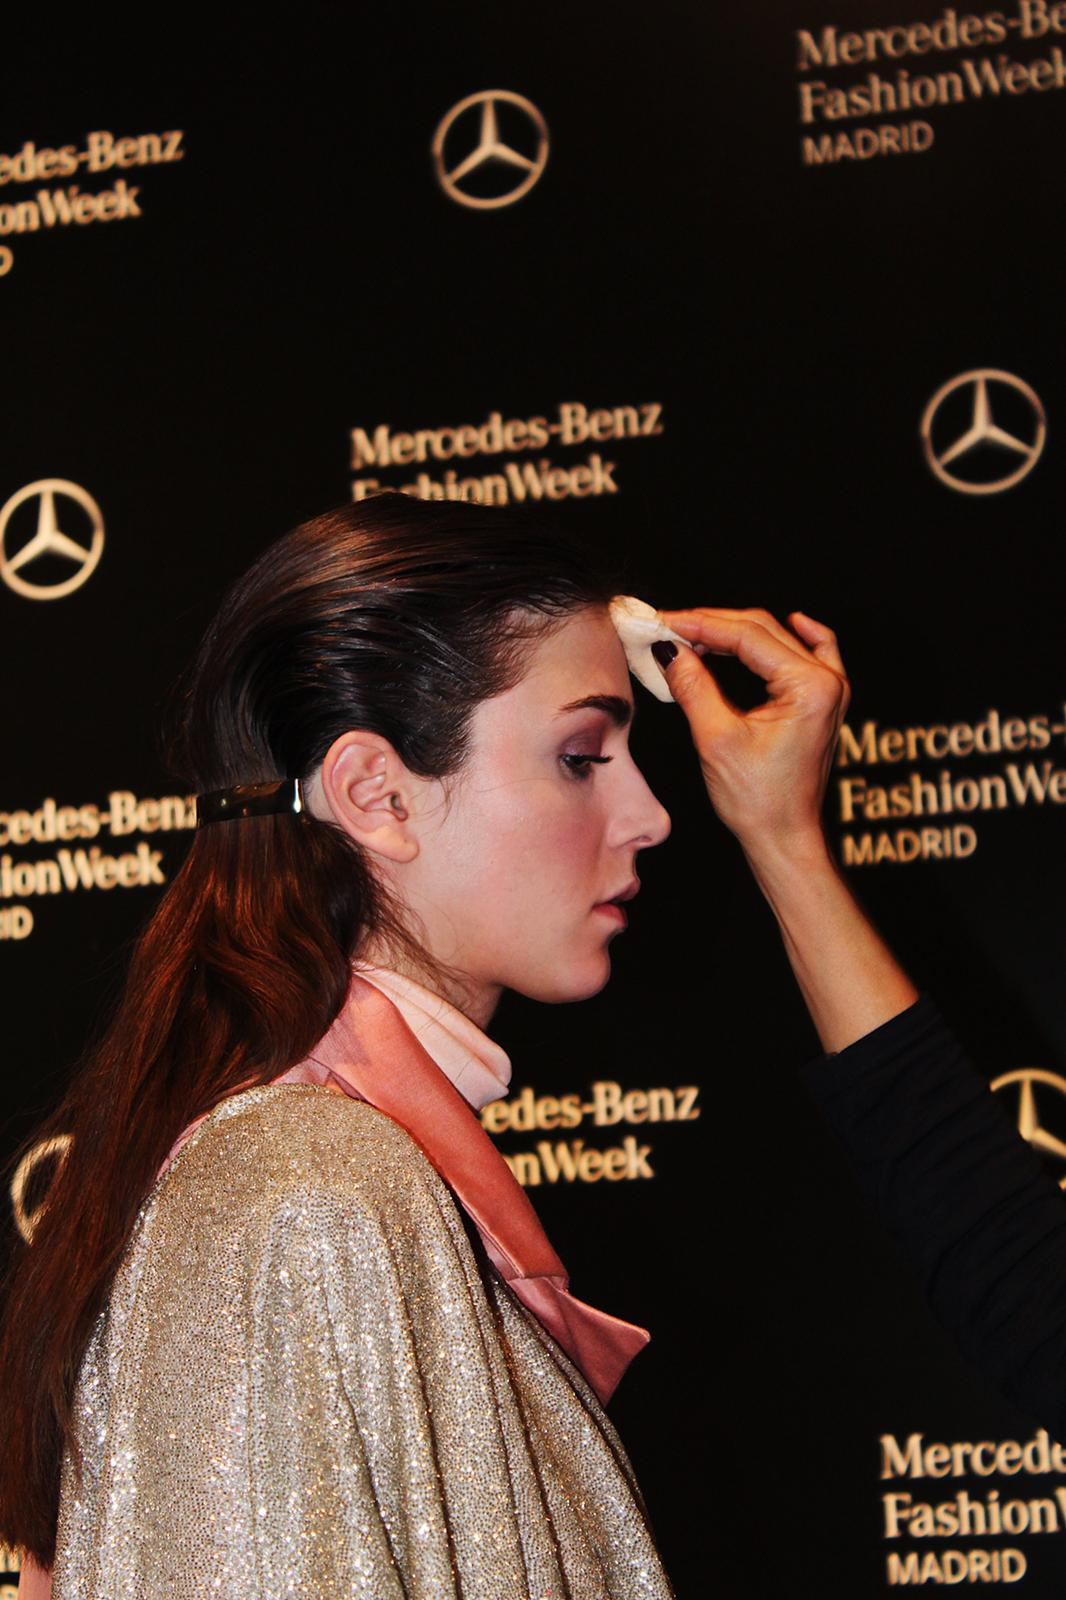 Diseñadora: Isabel Núñez. Autora: Lucía Martínez alumna de 4º de Periodismo y CGM